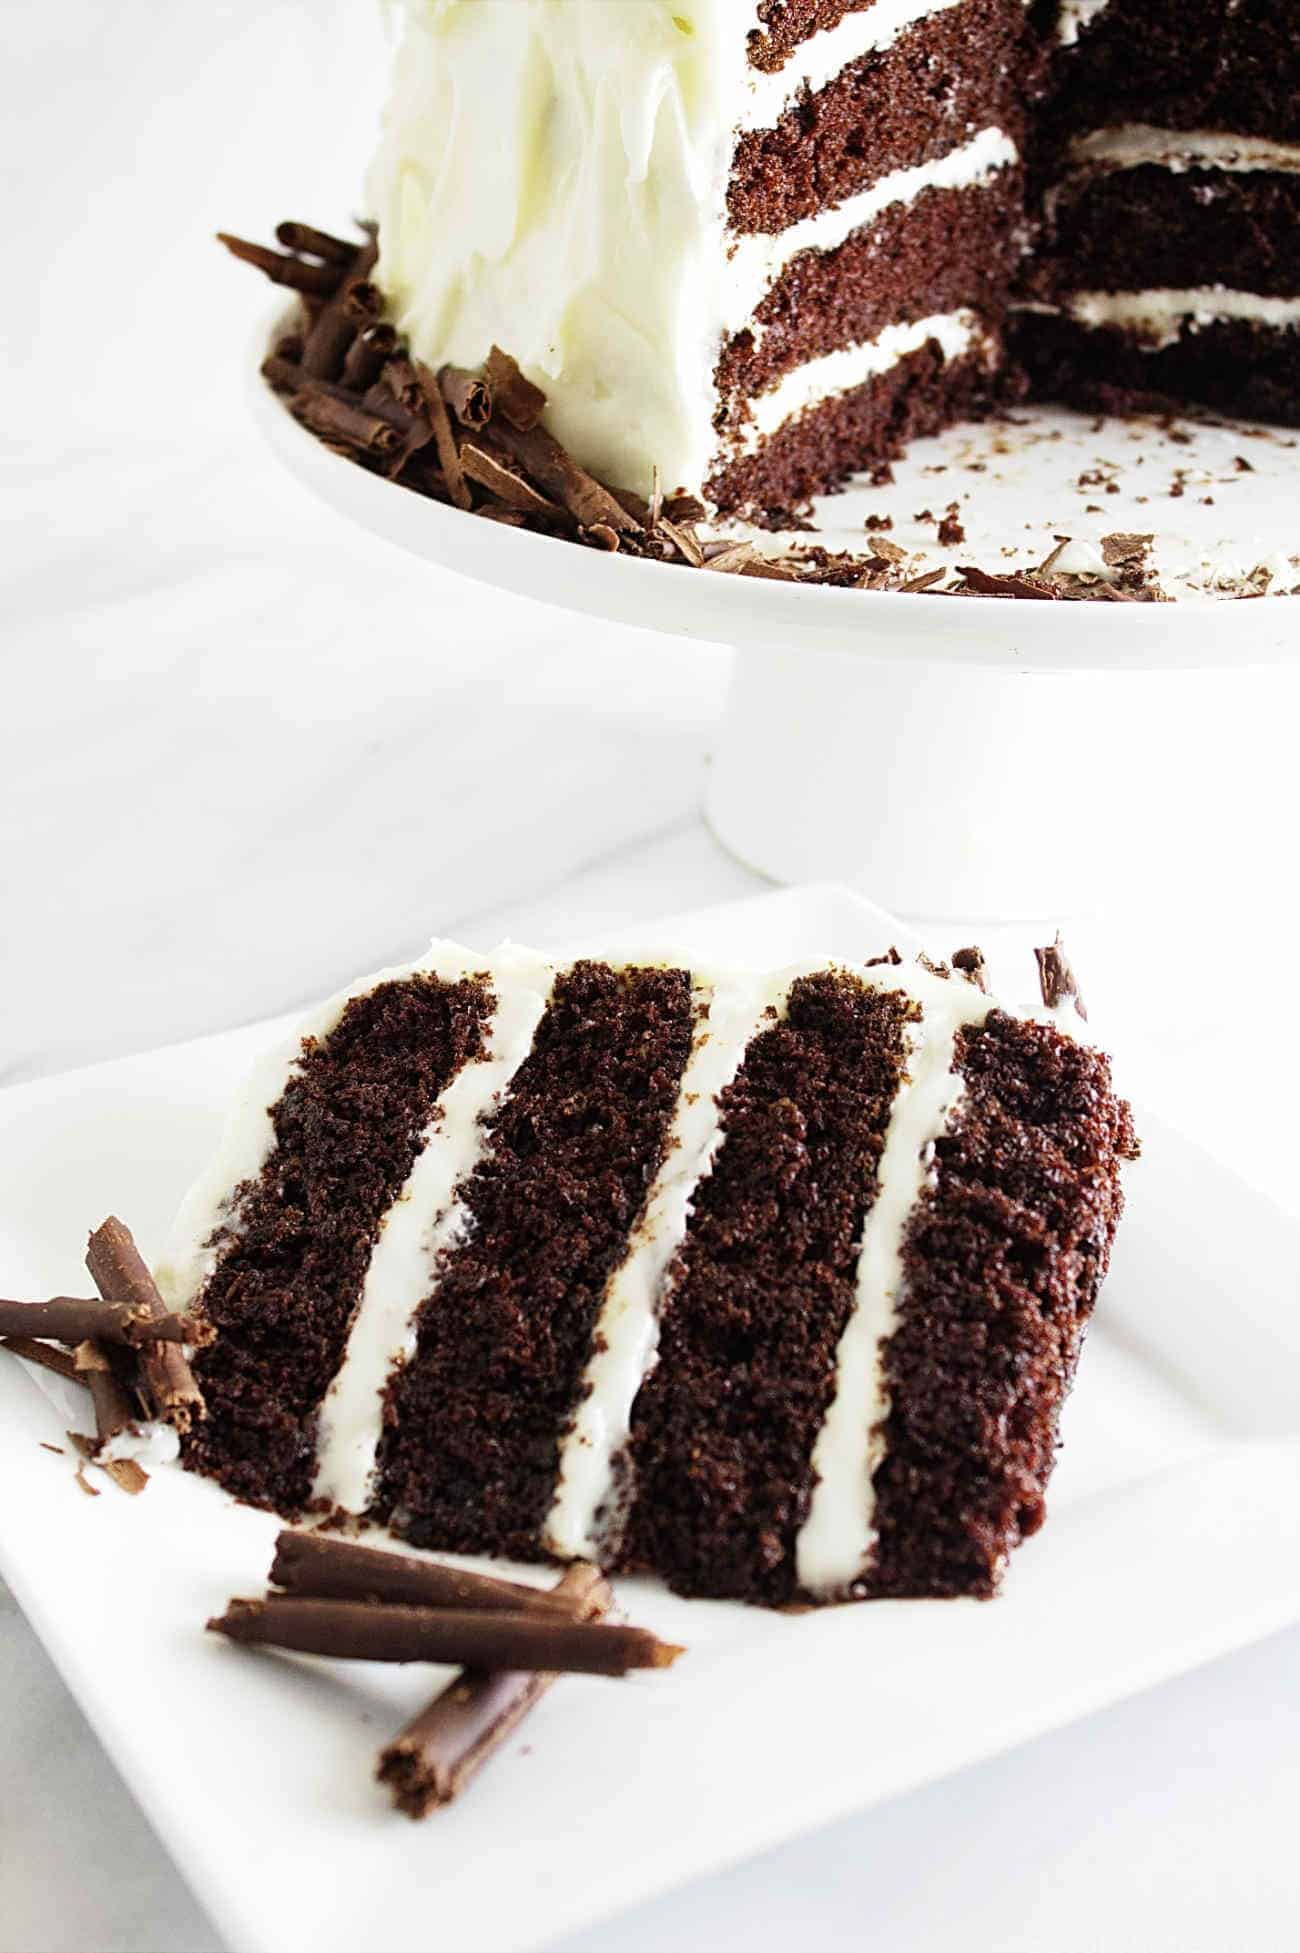 Easy Way To Make Coffee Cake